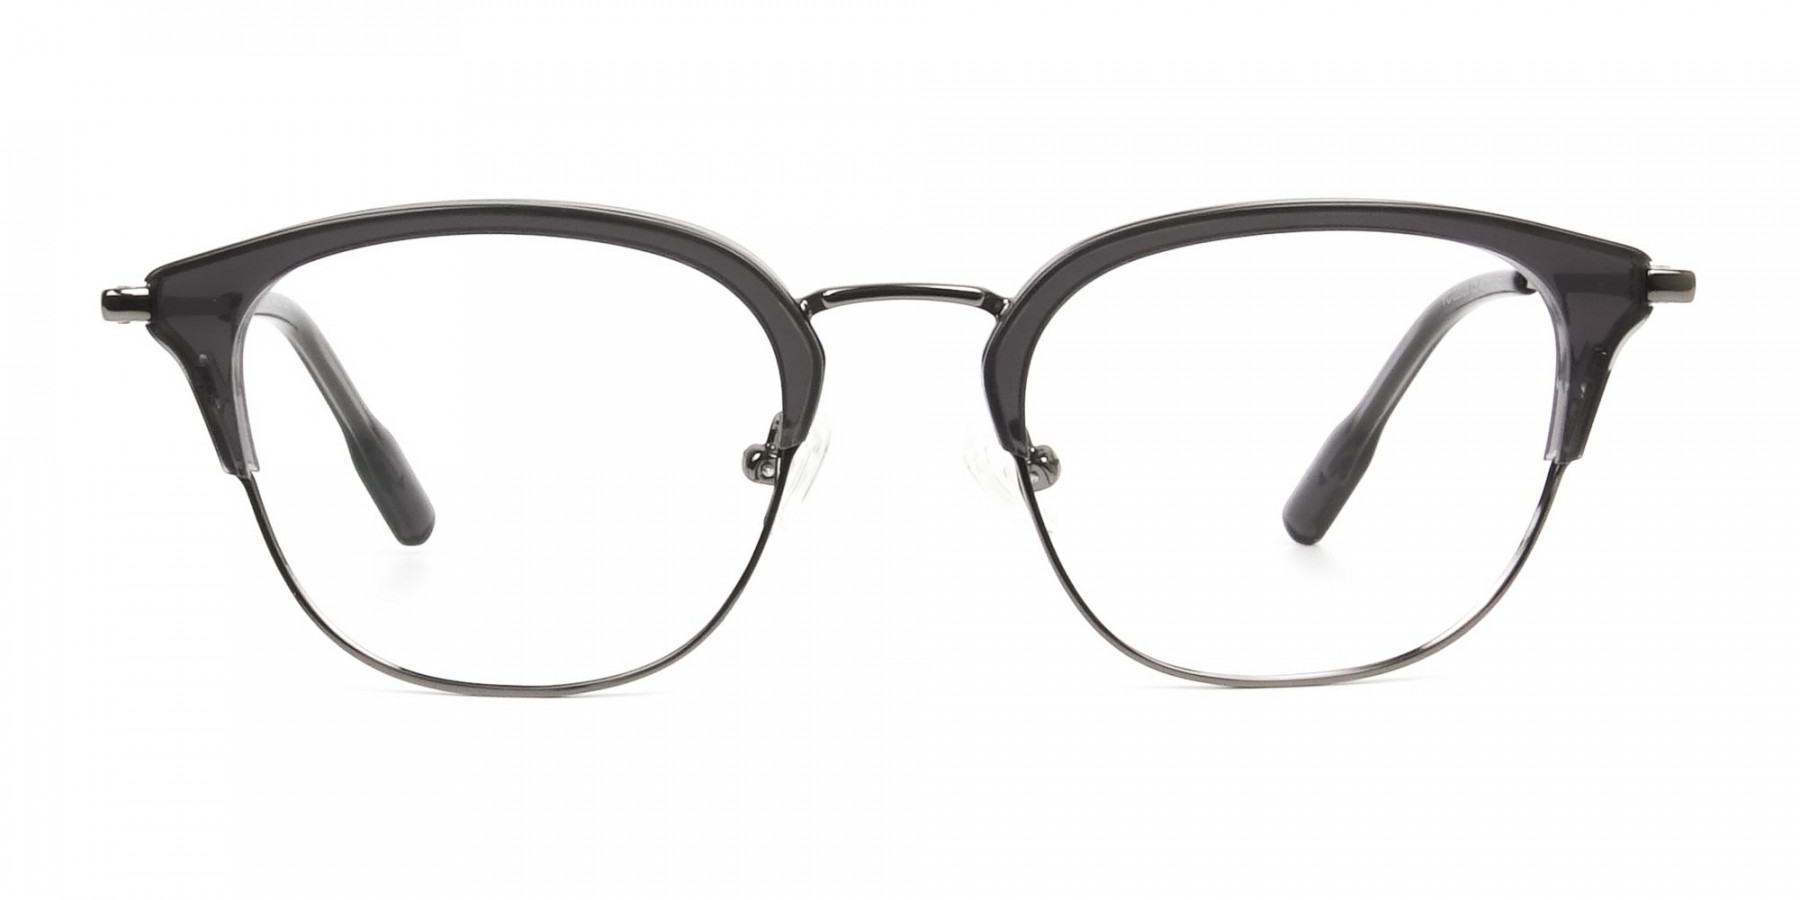 Wayfarer & Browline Gunmetal Silver Grey Translucent glasses - 1